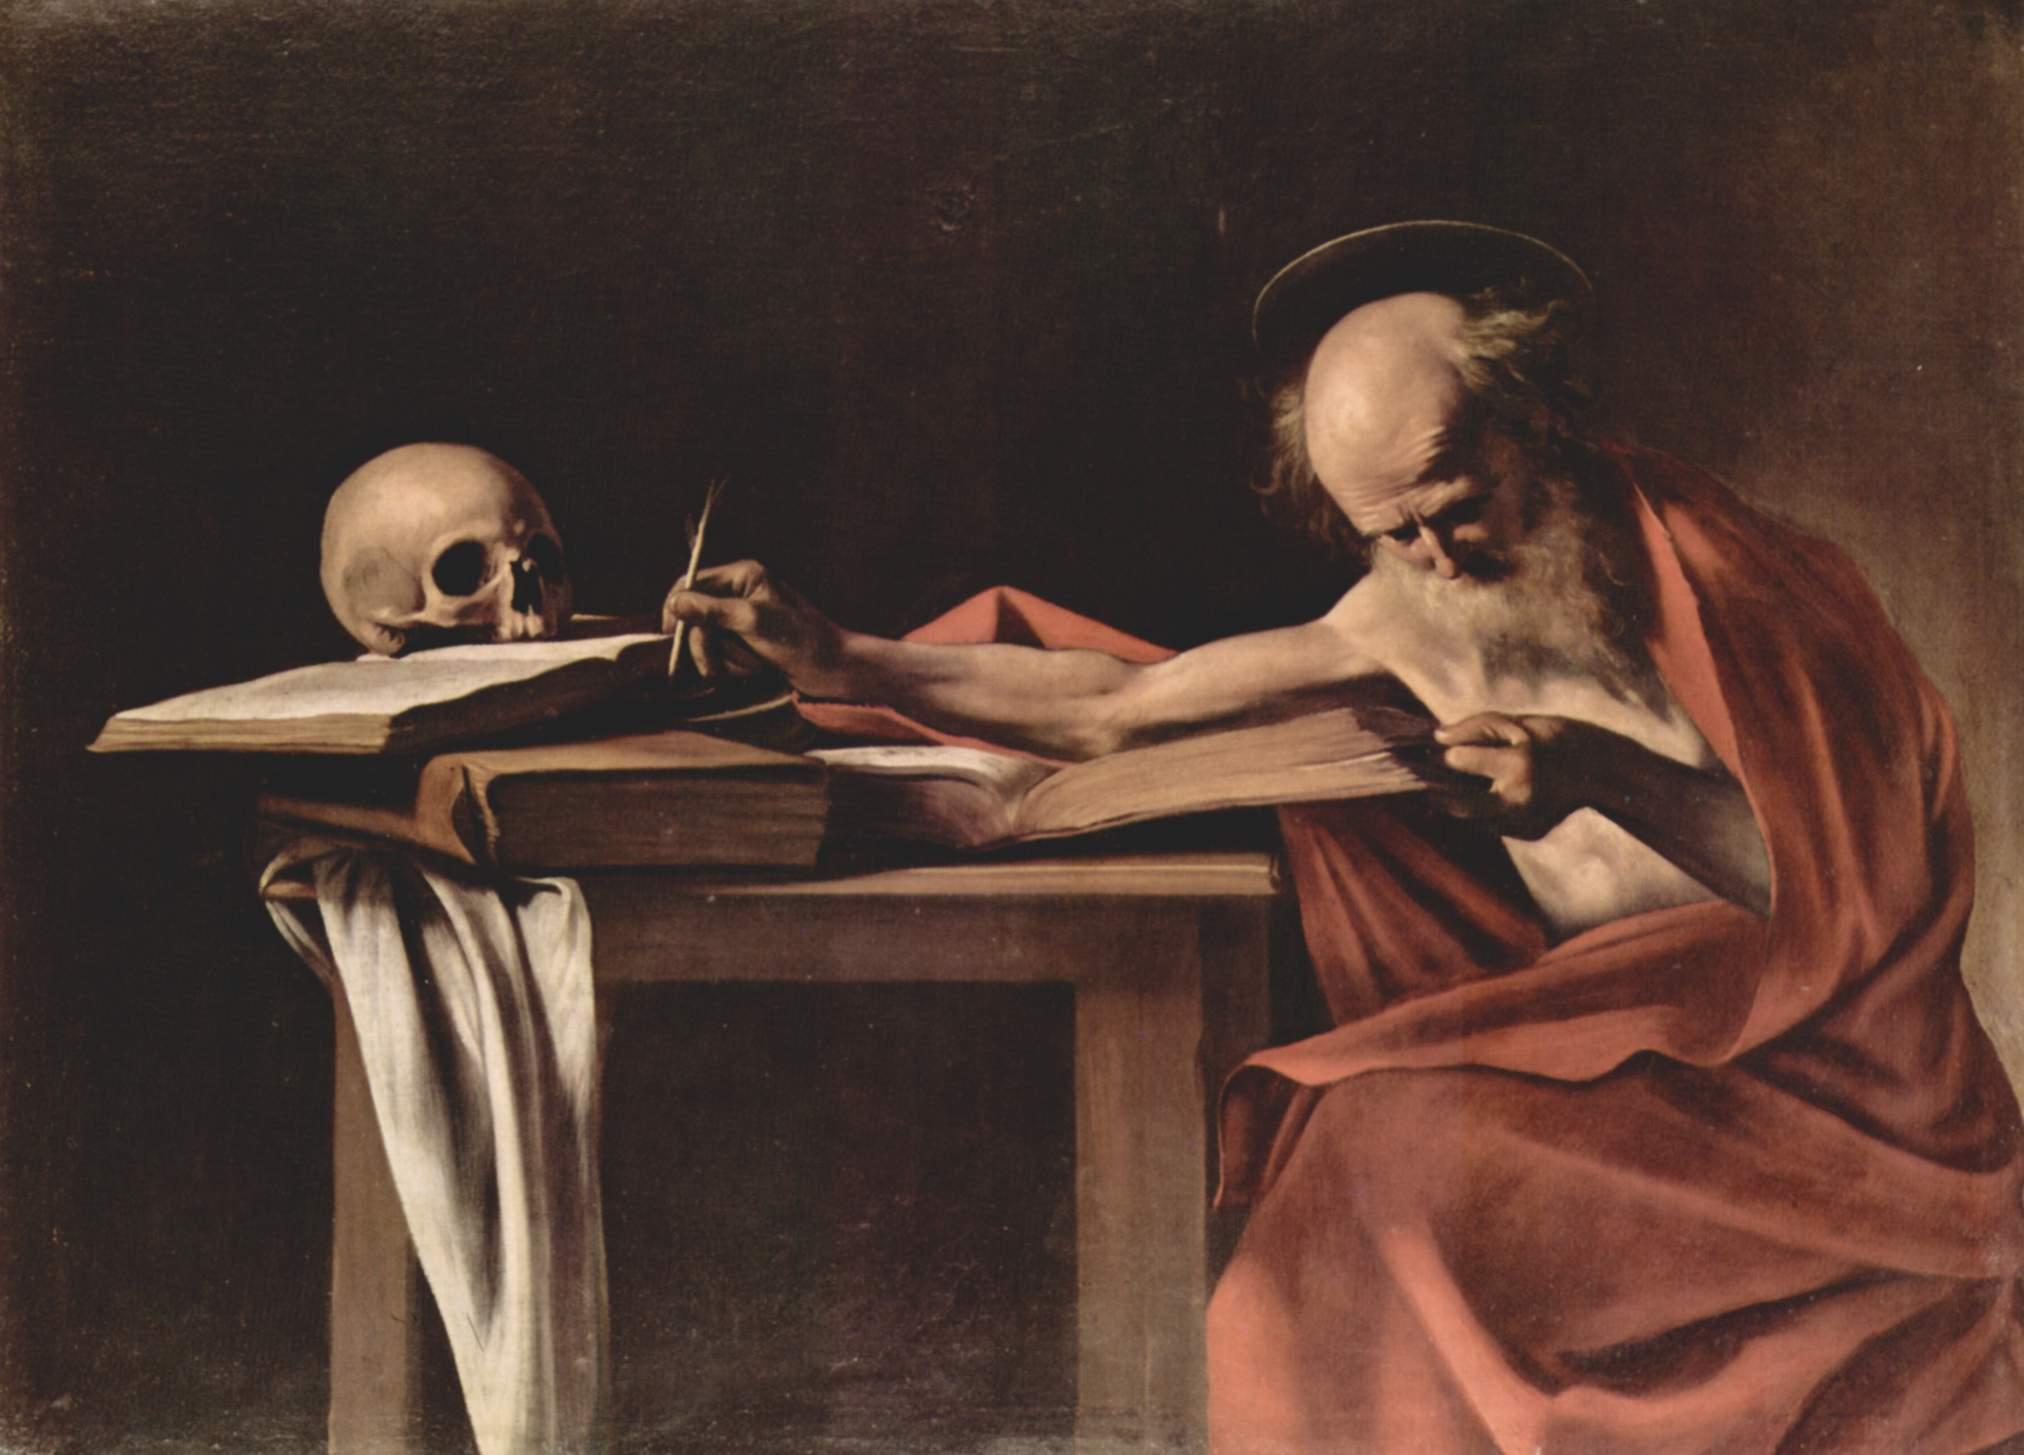 Пишущий св. Иероним, Микеланджело Меризи де Караваджо